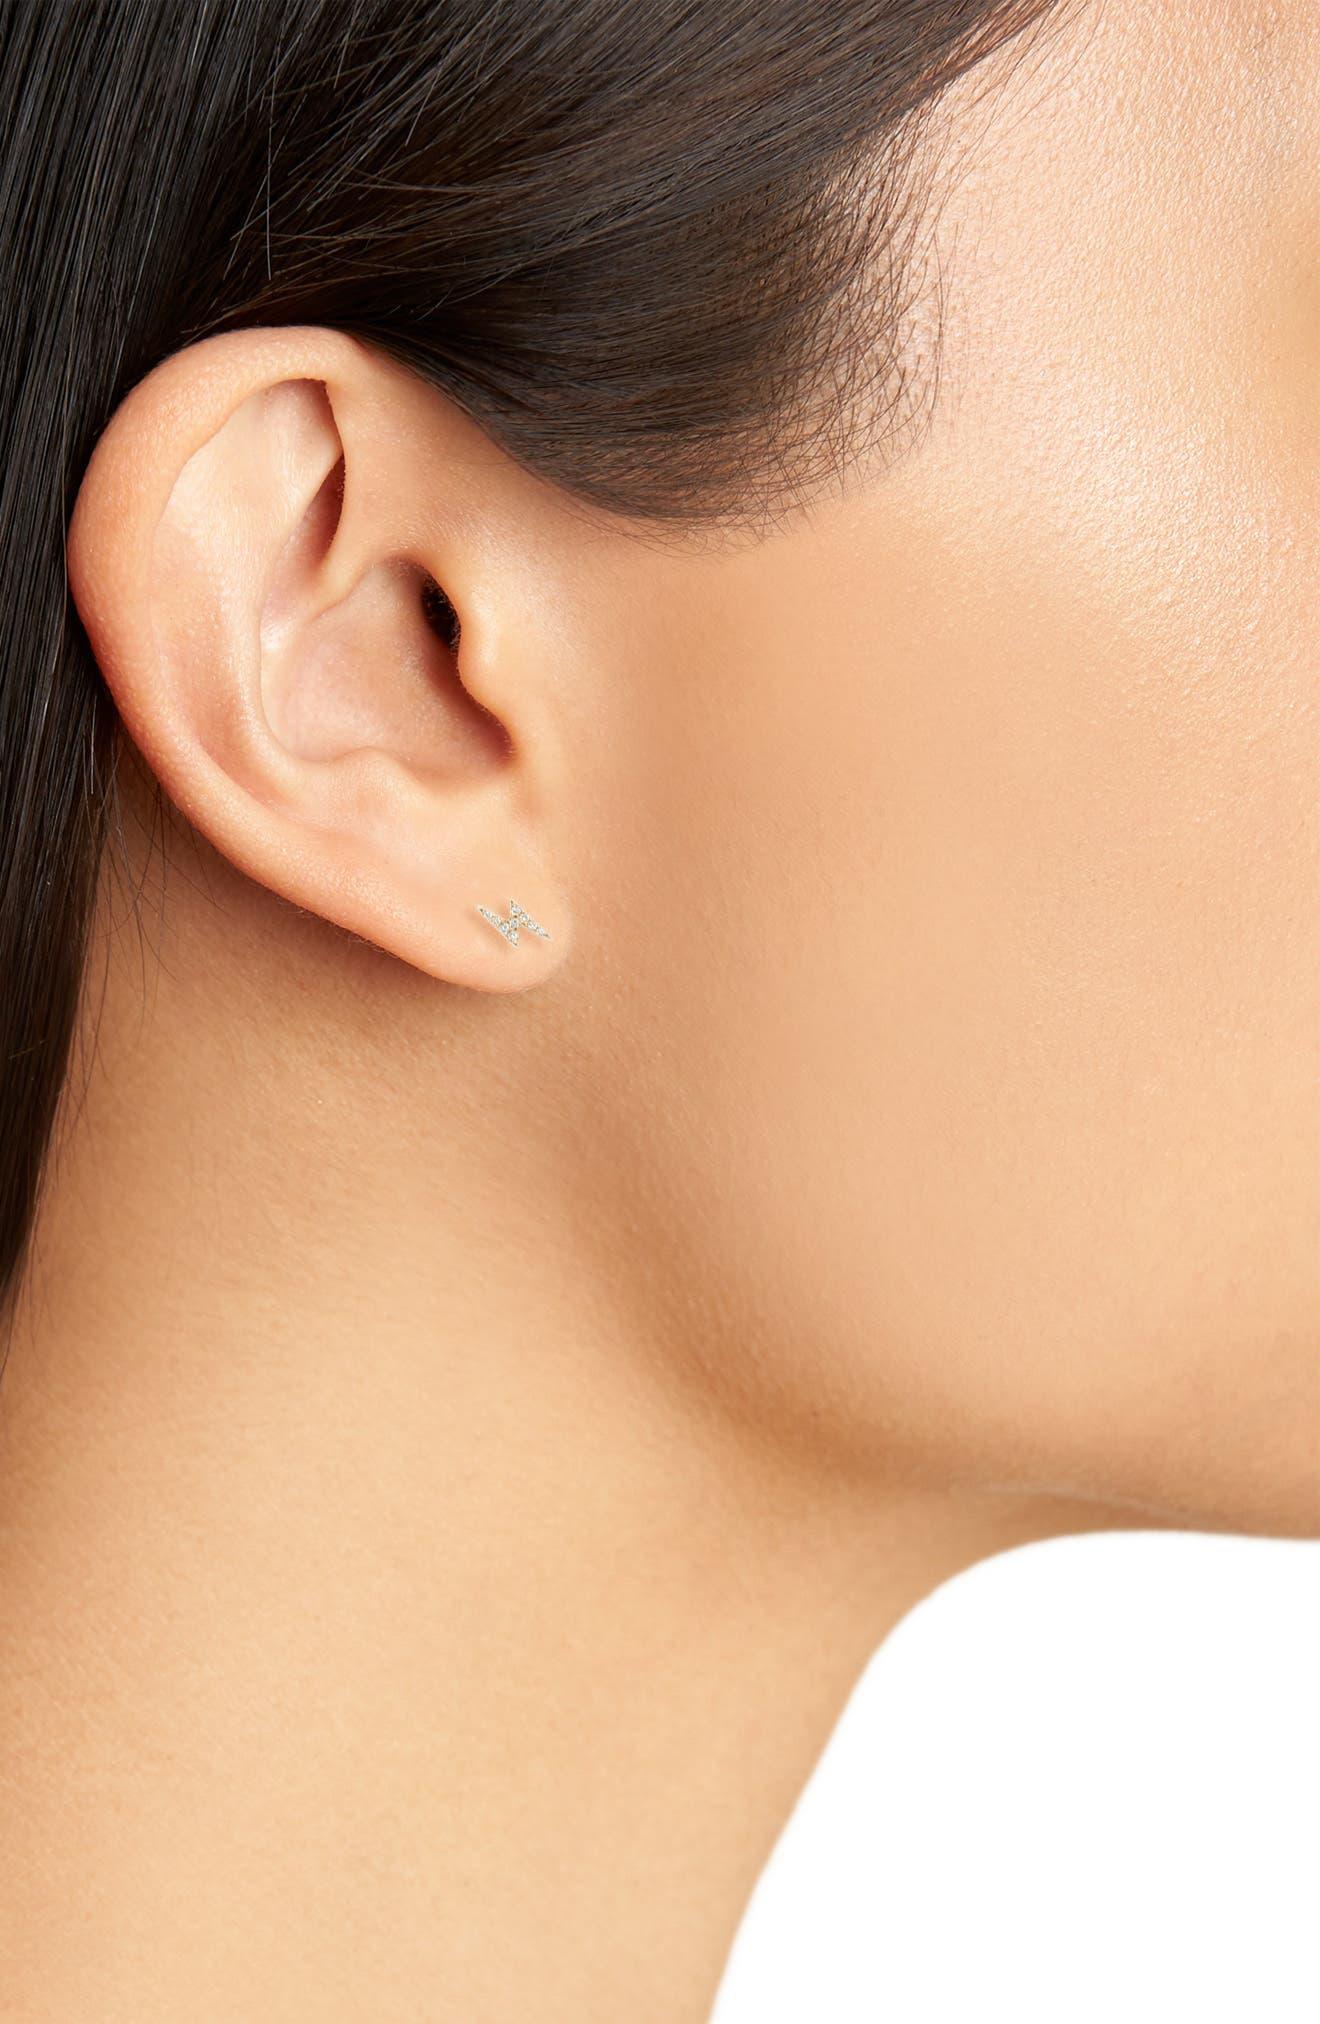 Diamond Stud Earrings,                             Alternate thumbnail 2, color,                             710